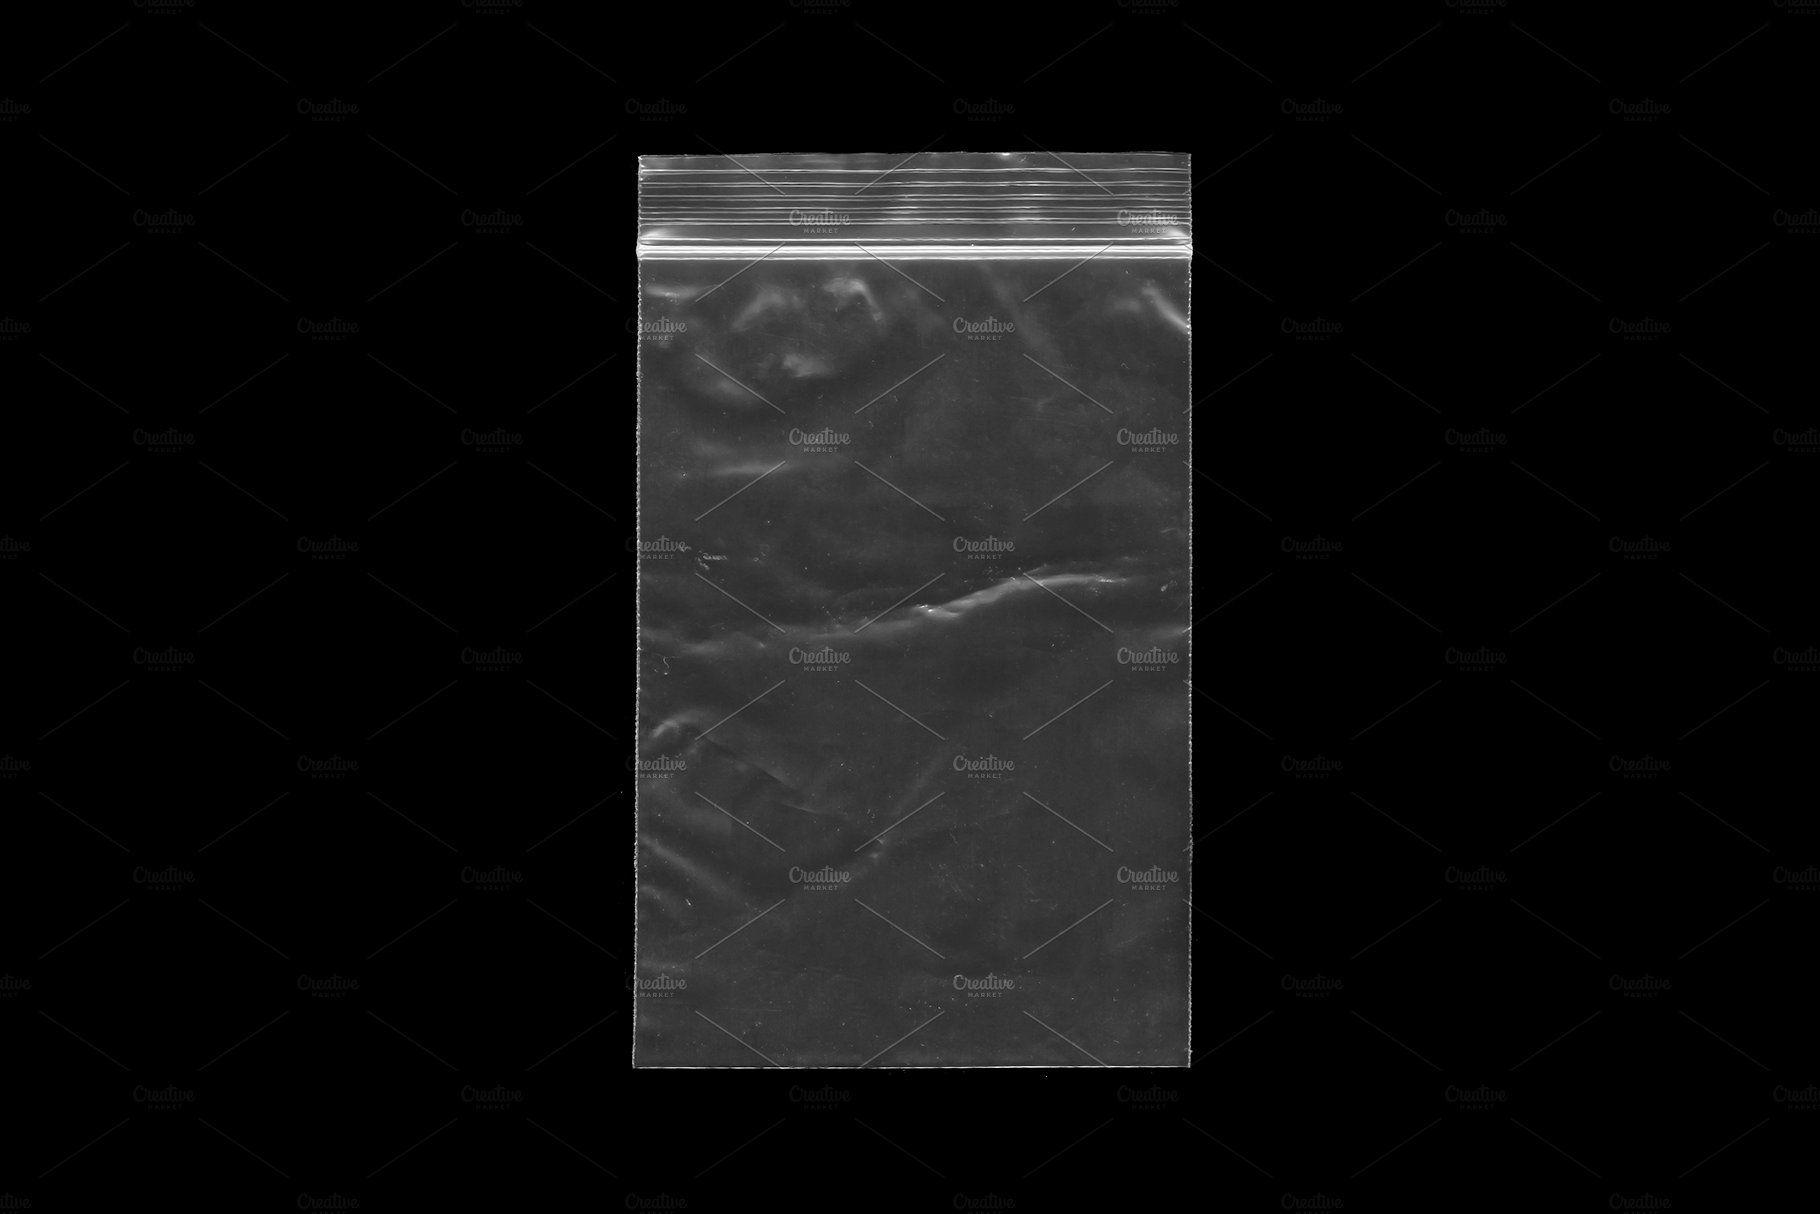 Download Plastic Bag Mockup Psd Mockup Psd Bag Mockup Mockup